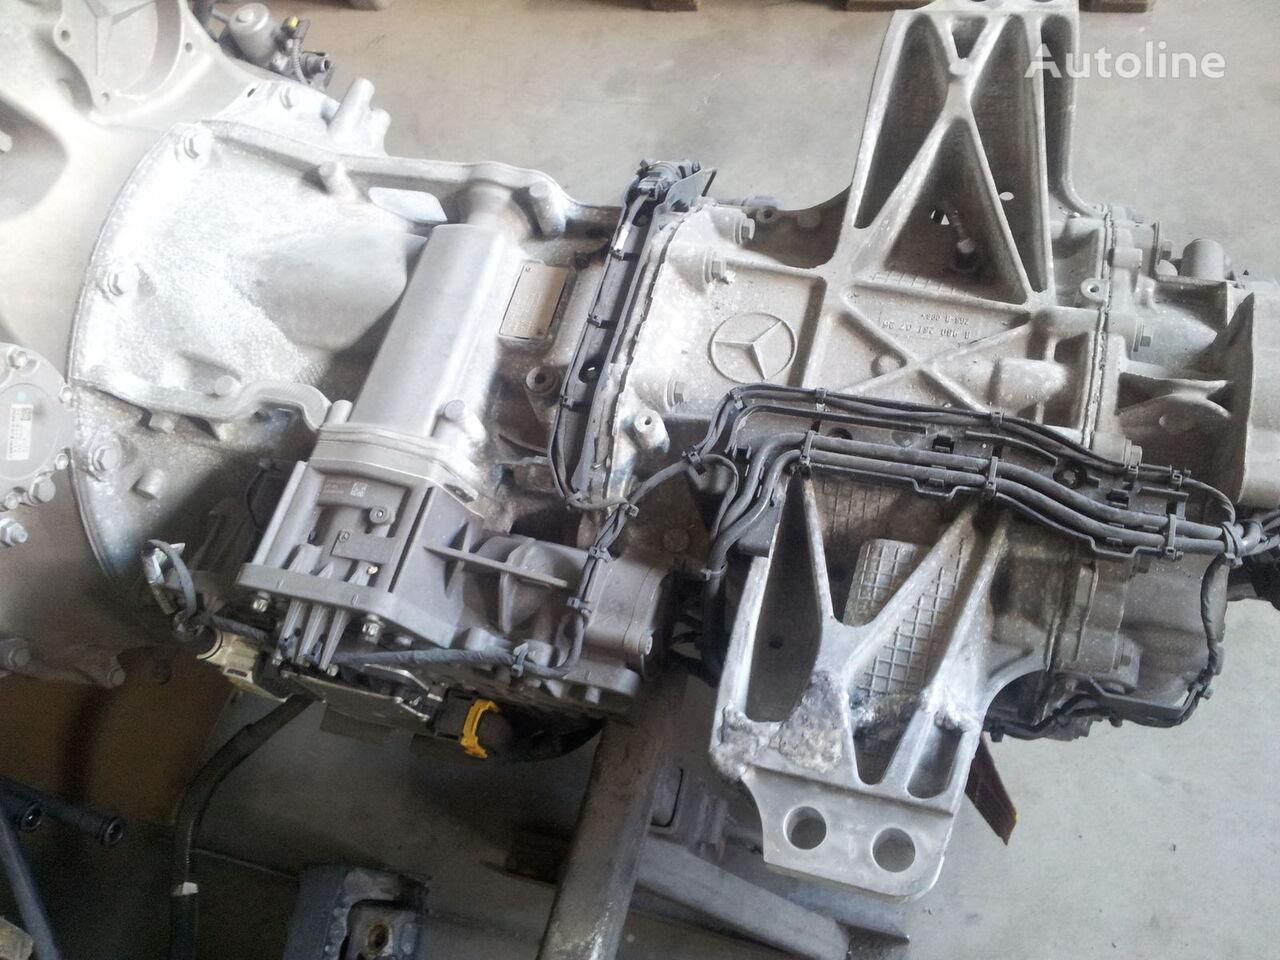 КПП MERCEDES-BENZ Actros MP4, EURO5, EURO6, gearbox G211-12KL для тягача MERCEDES-BENZ Actros MP4 EURO6